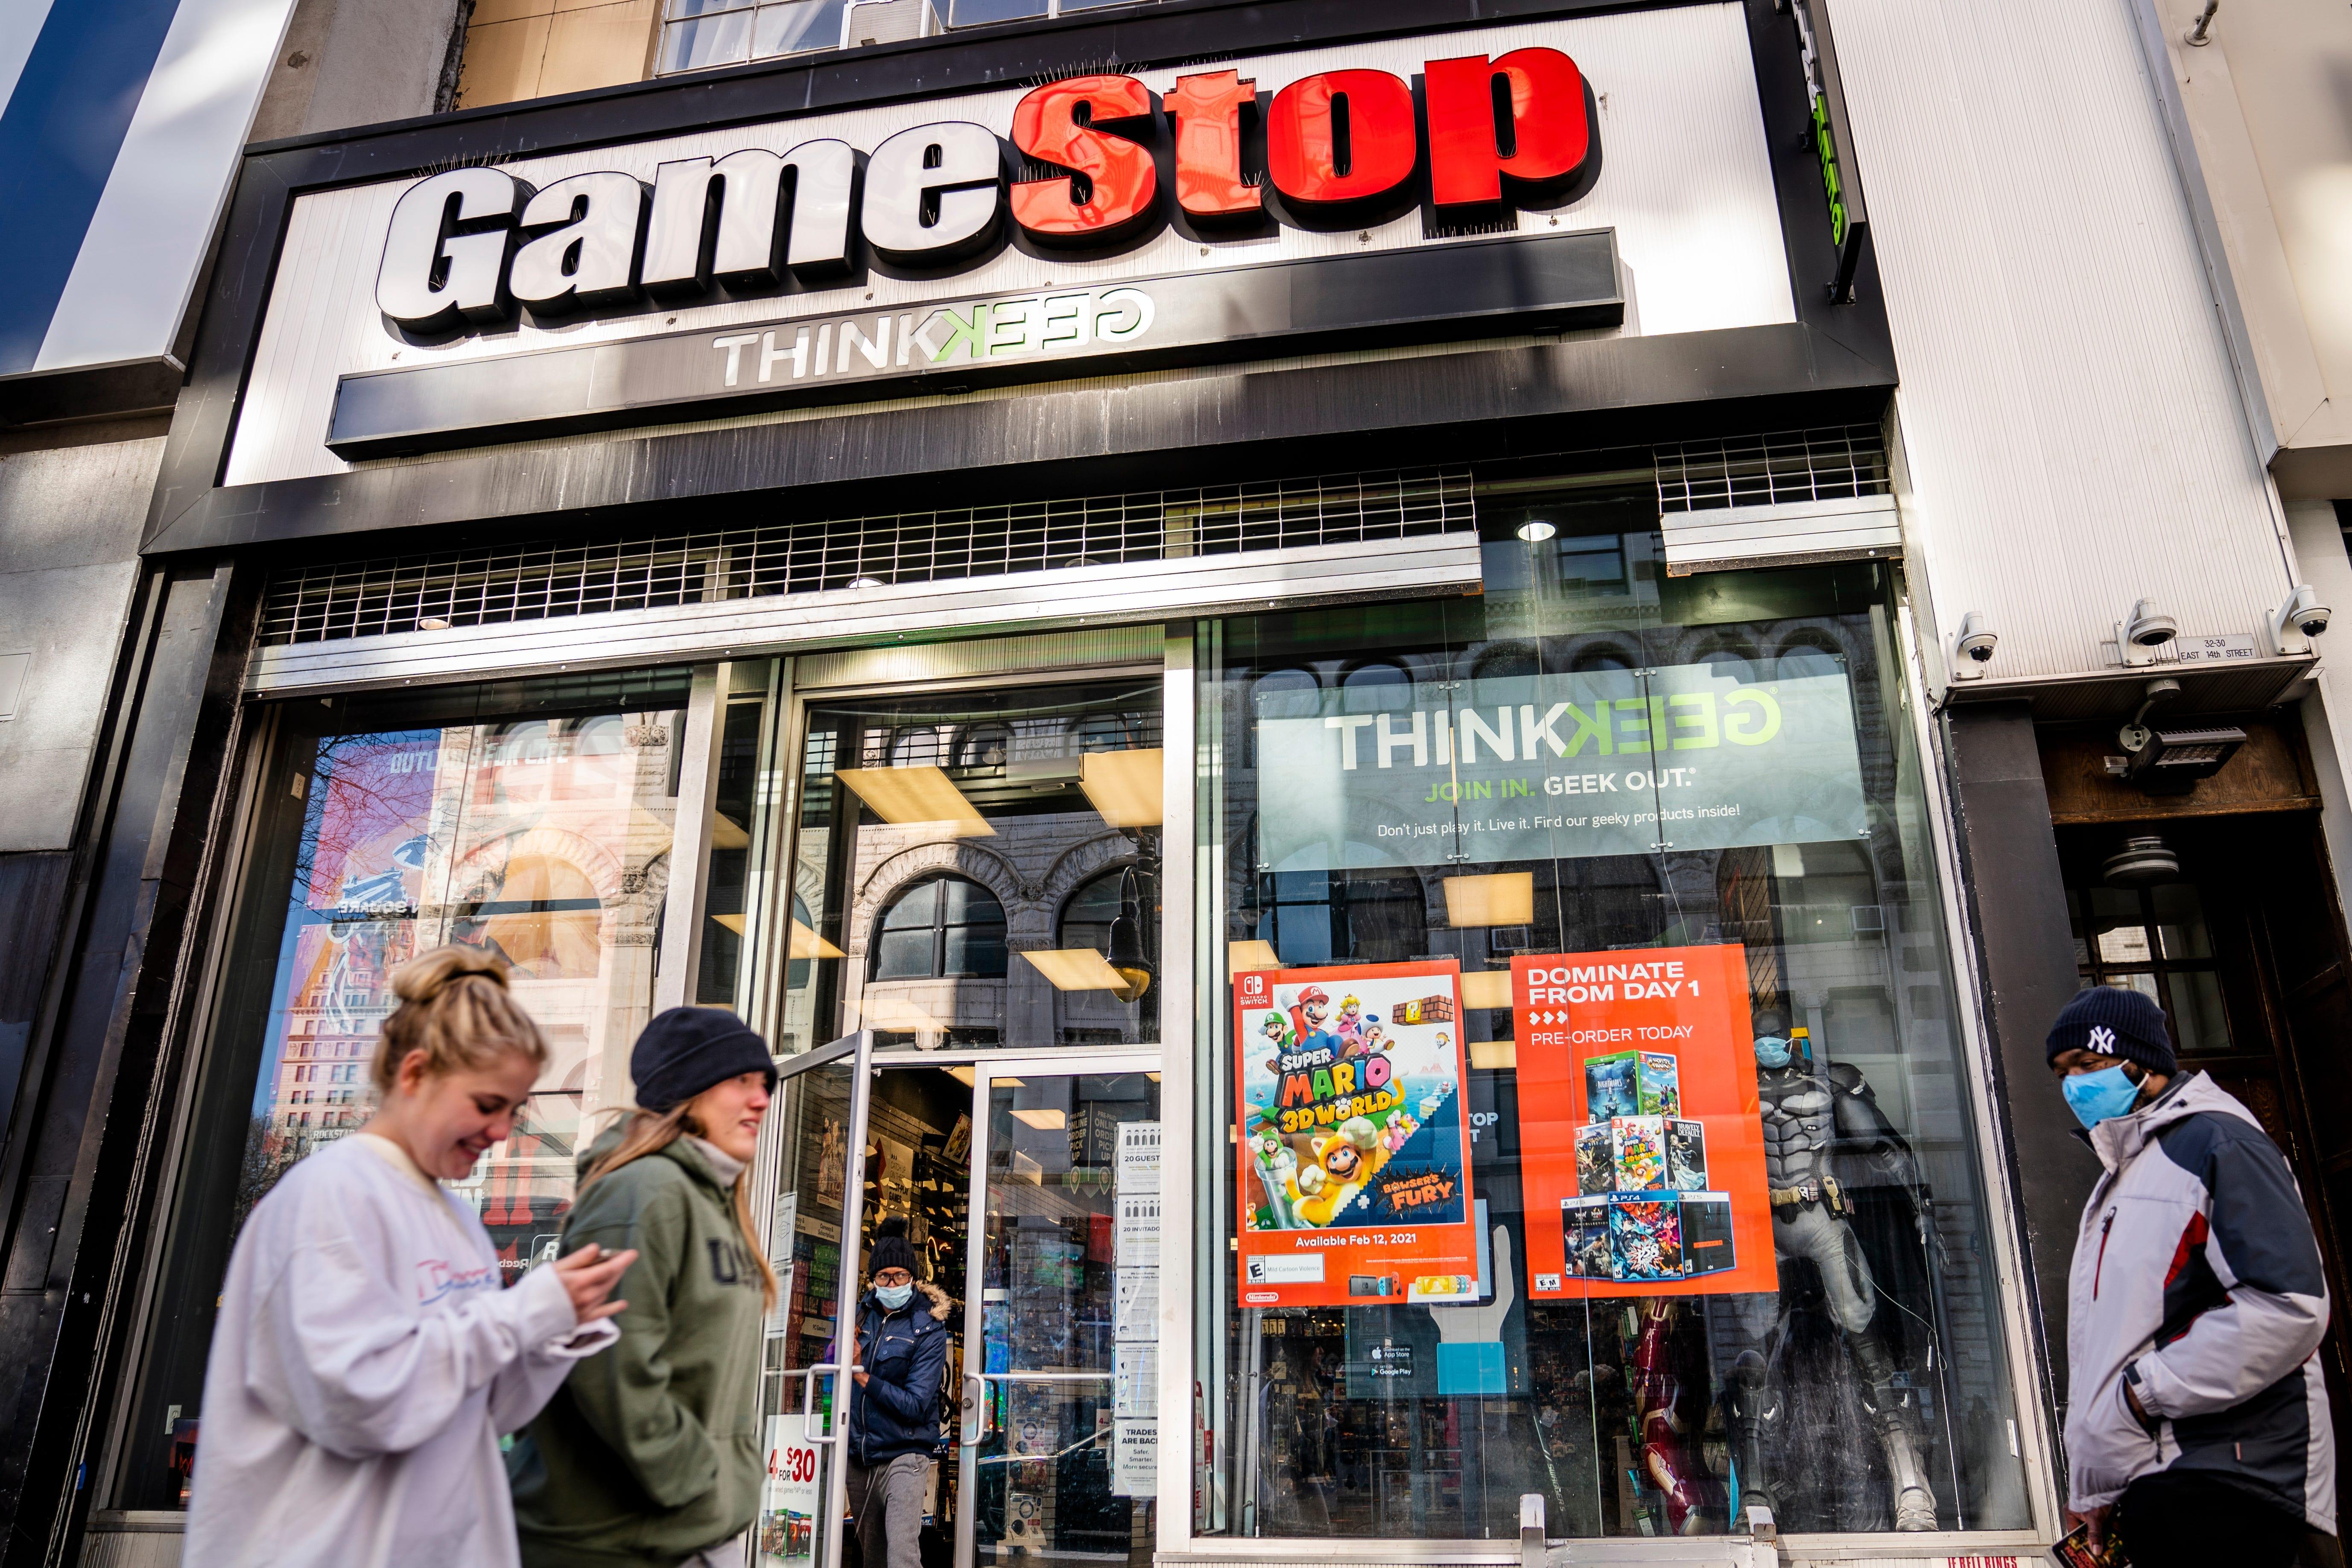 GameStop CEO to depart in continuing leadership shakeup